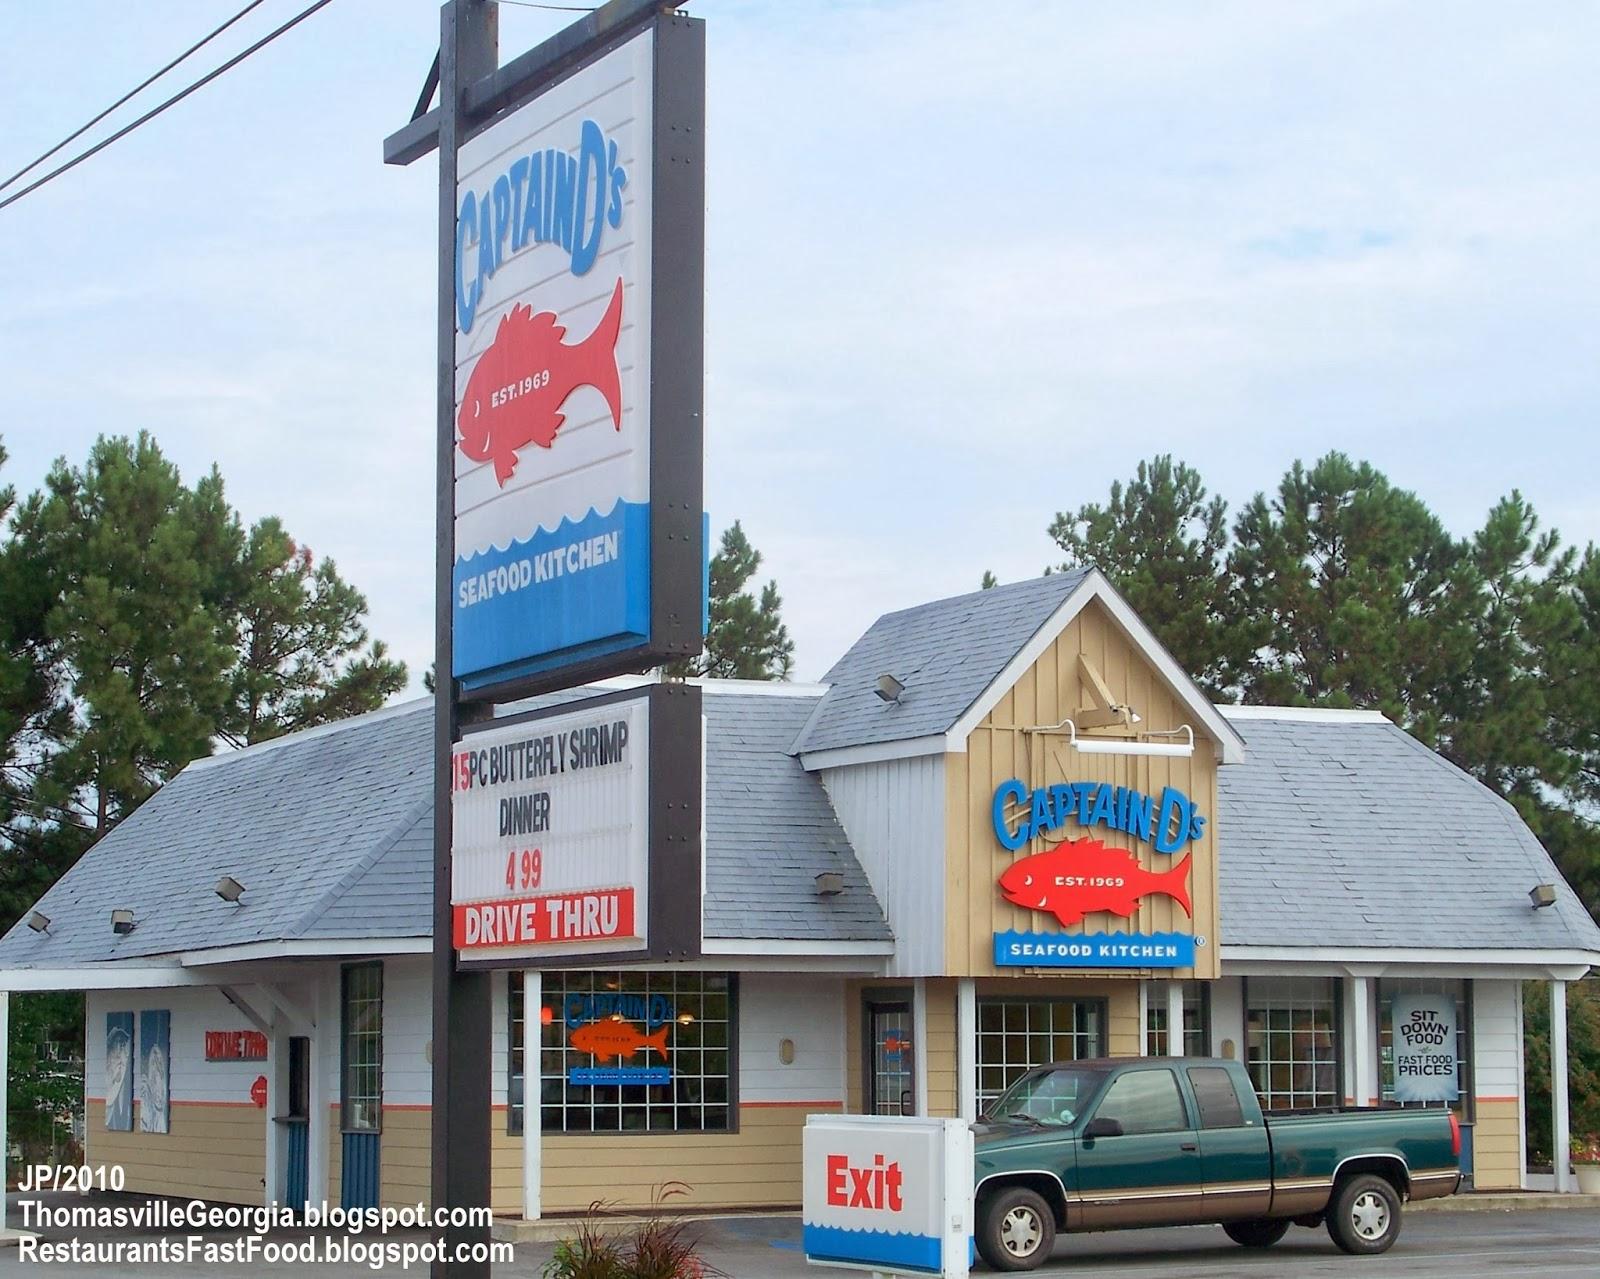 Fast Food Fish Restaurants Near Me | Best Restaurants Near Me - photo#28